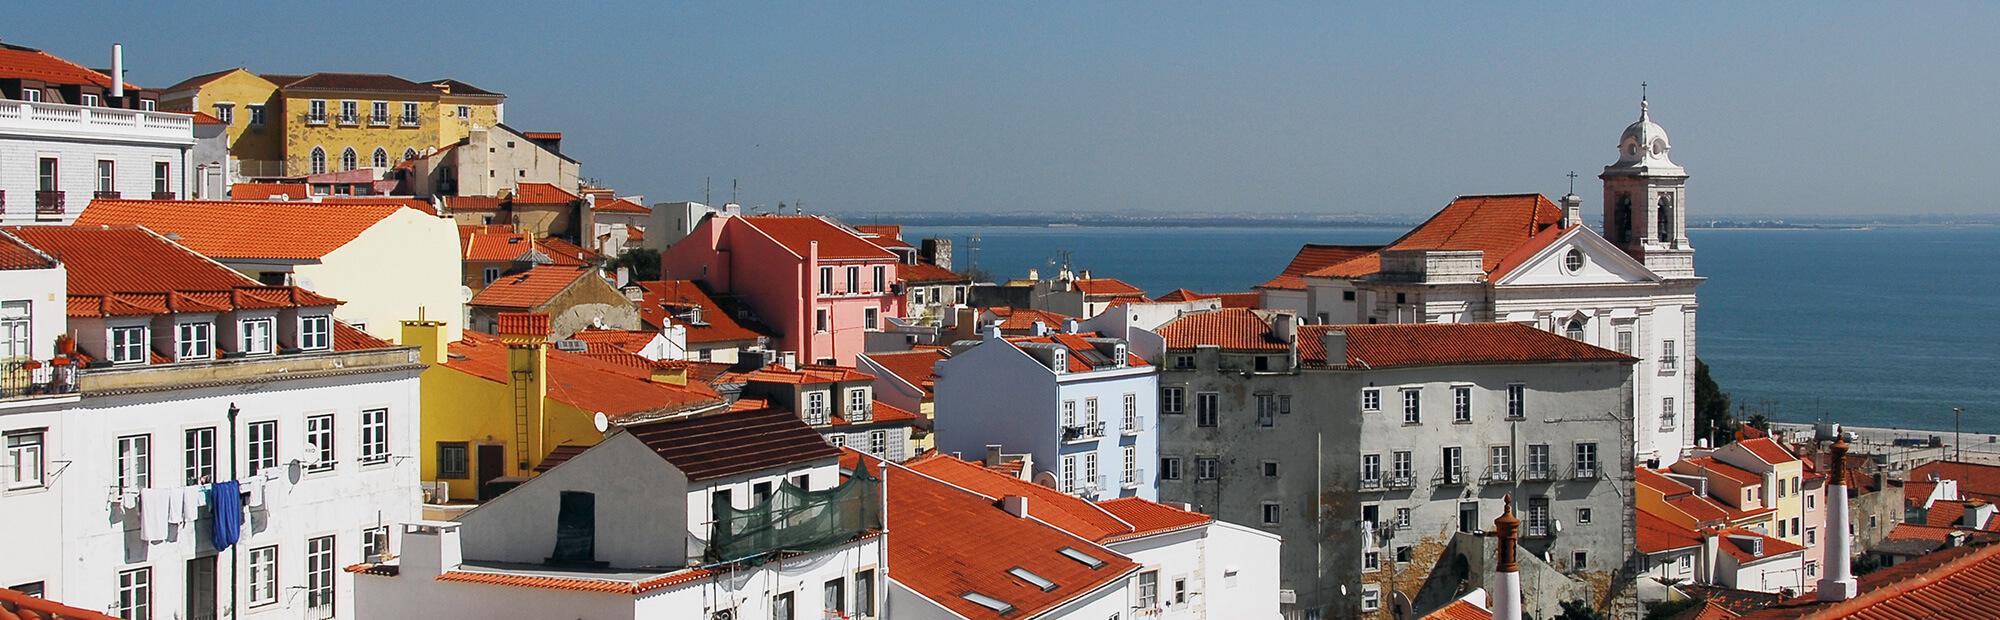 Rechtsanwaltskanzlei Veiga Portugal Lissabon